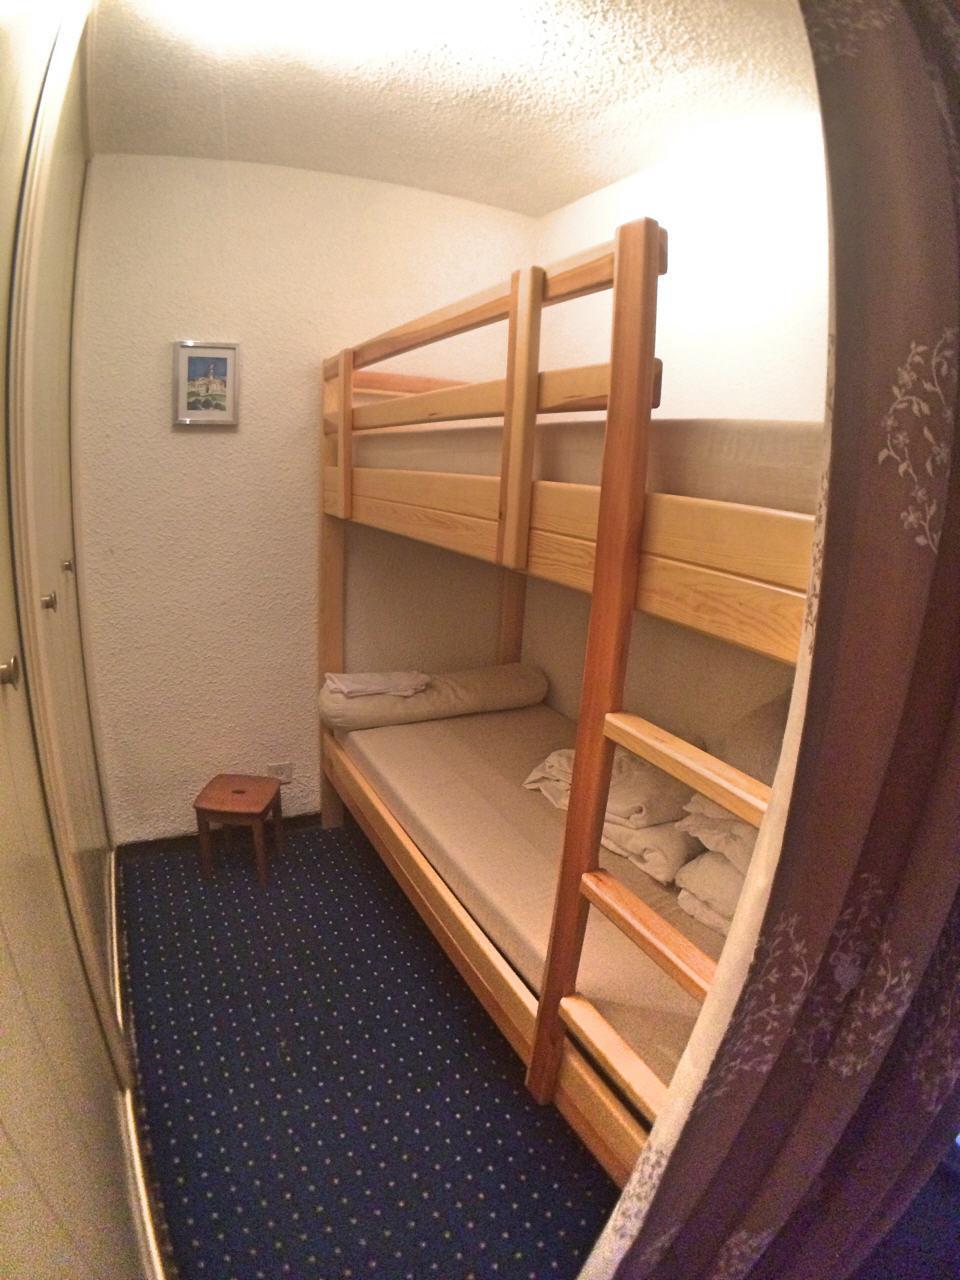 Location au ski Appartement 2 pièces cabine 5 personnes (302) - Residence Le Forest - Vars